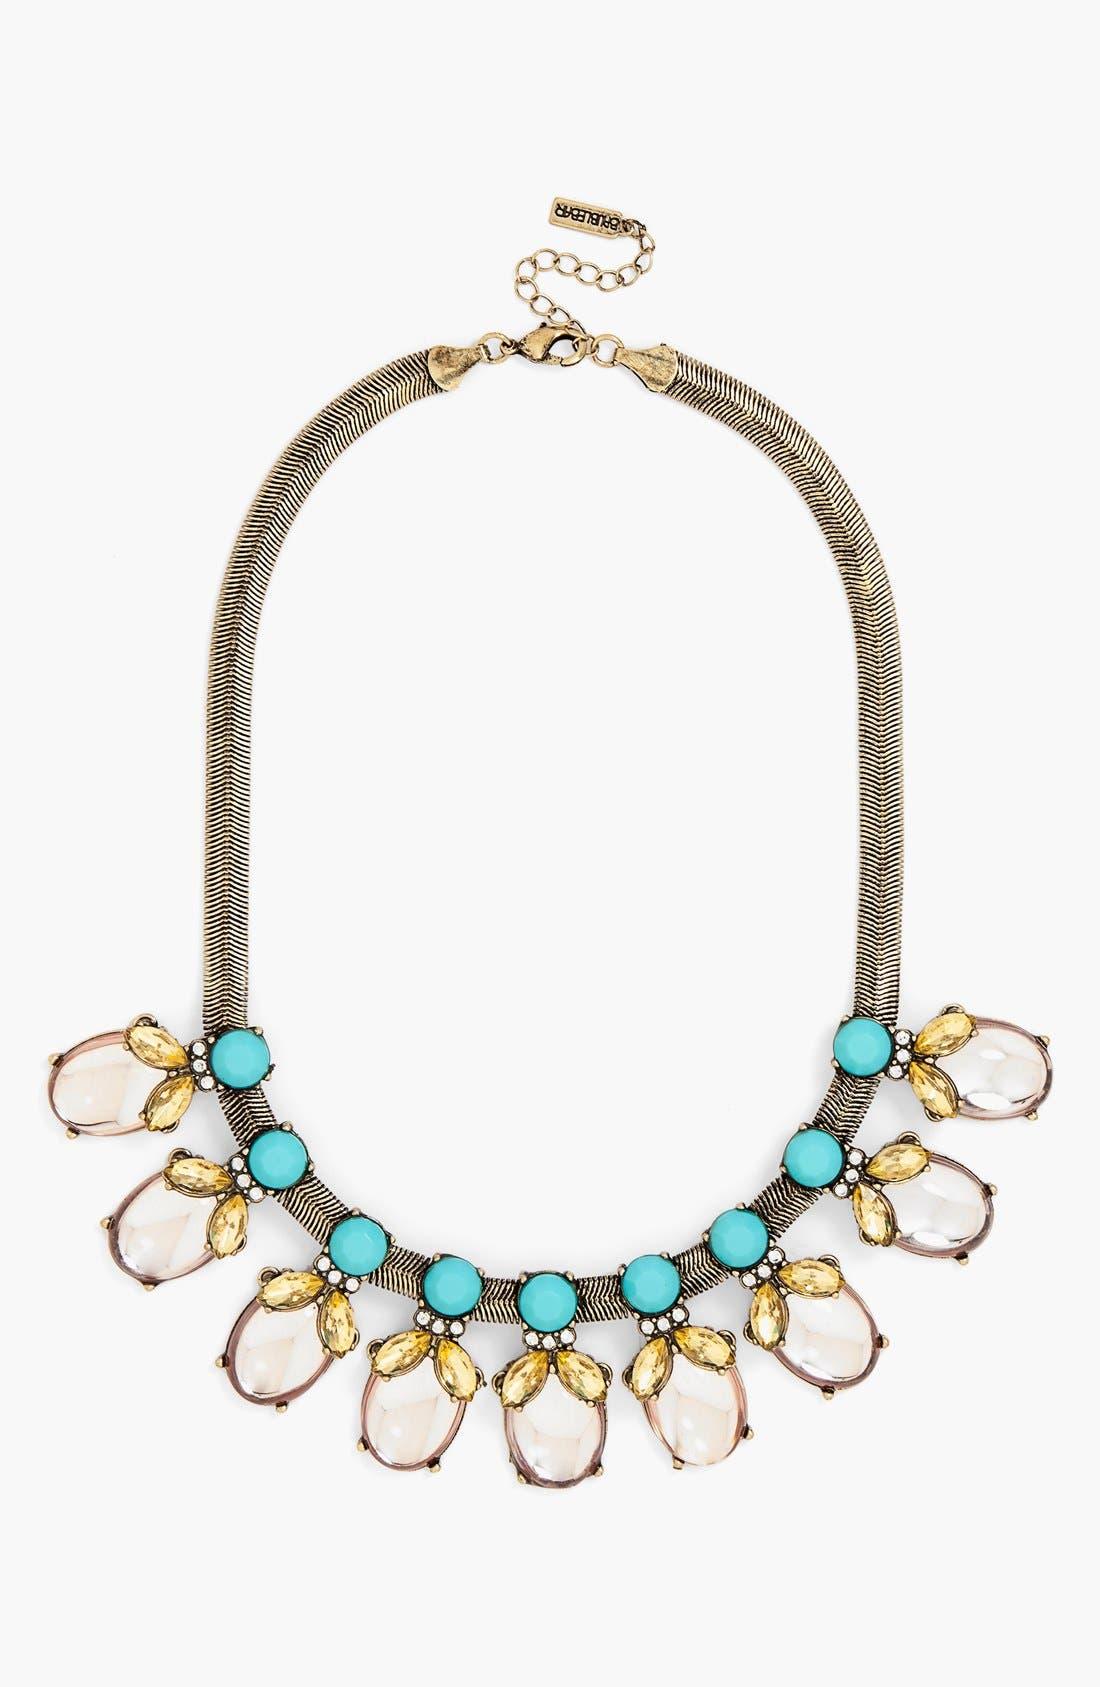 Main Image - BaubleBar 'Rosebud' Frontal Necklace